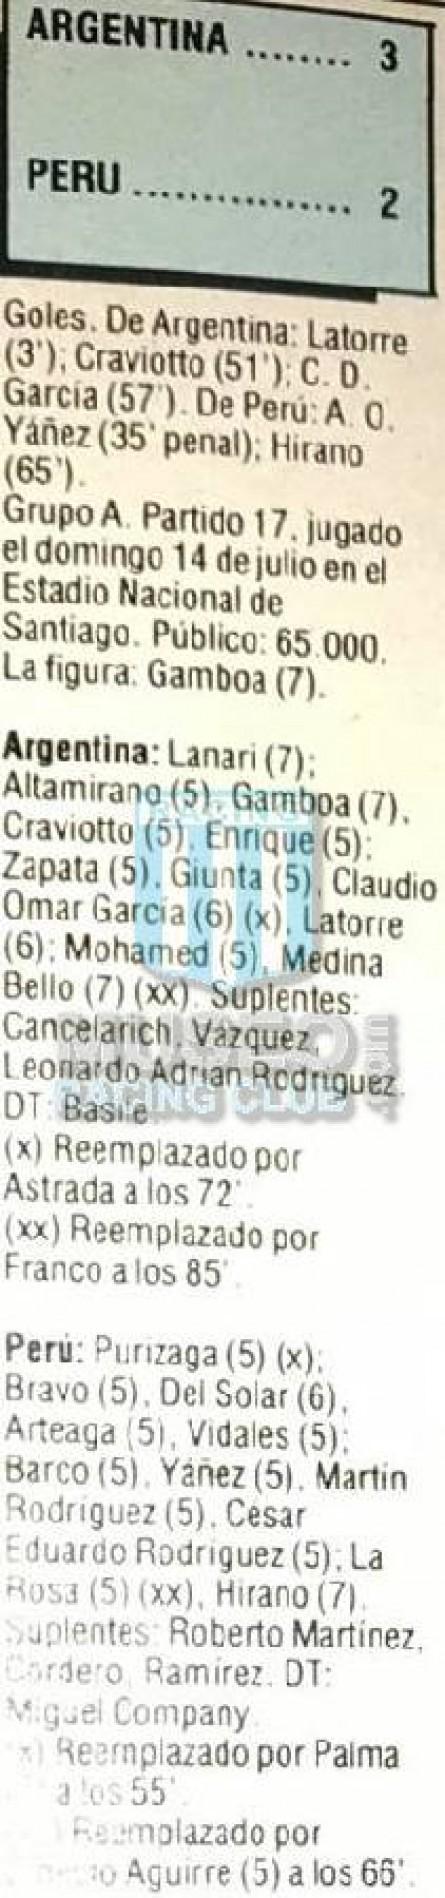 Peru_1991_Home_Diadora_ChileCopaAmericavsArgentina_FICHA_ML_11_JorgeHirano_jugador_01